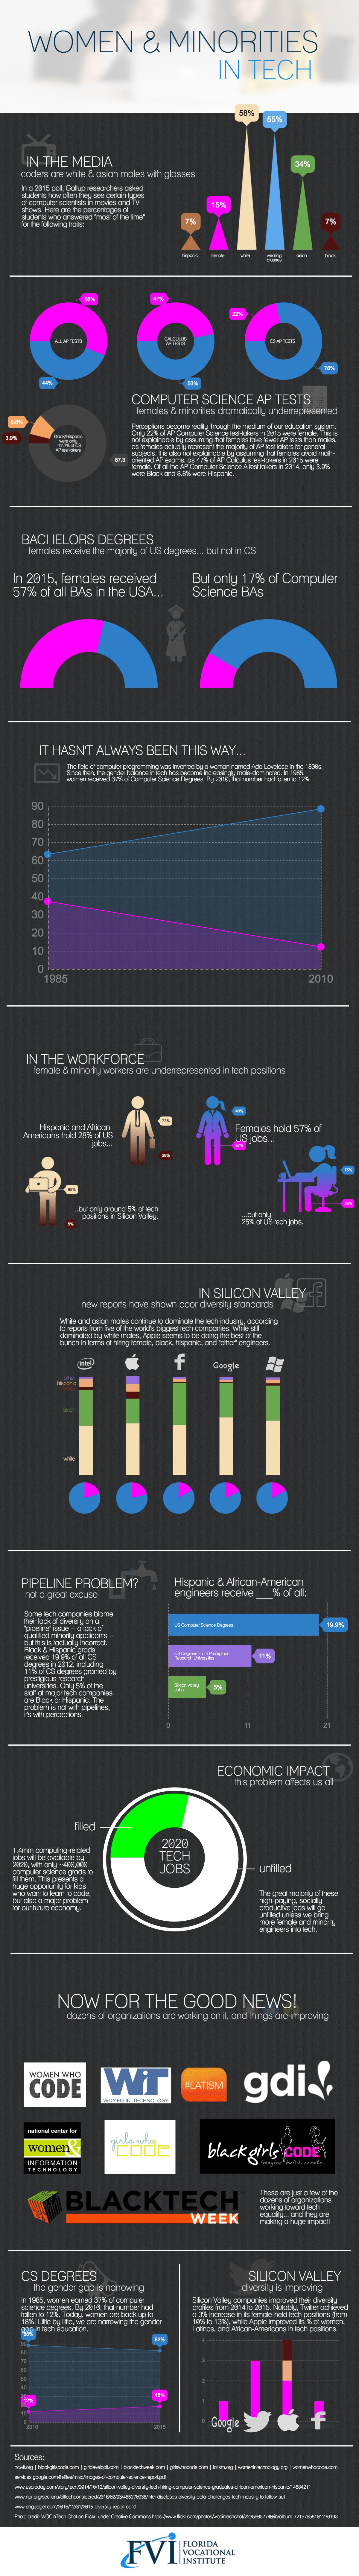 women-and-minorities-in-tech